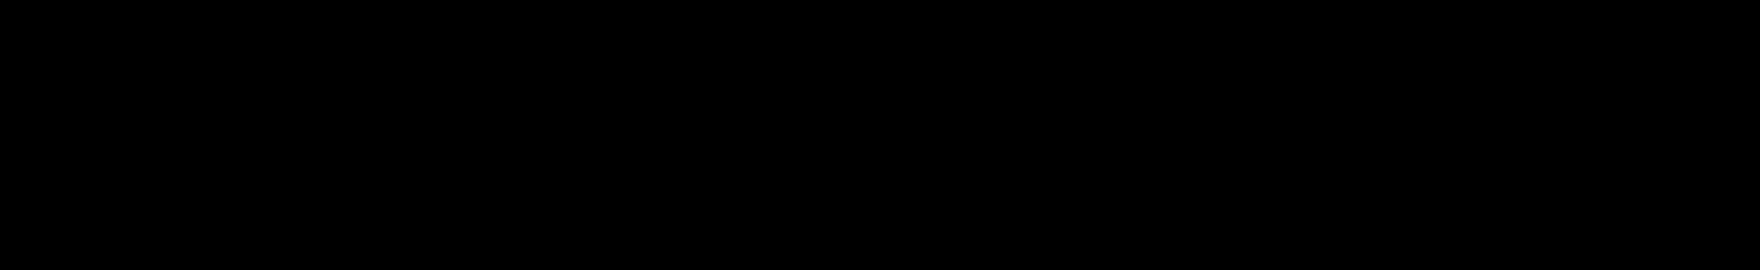 Panasonic black logo